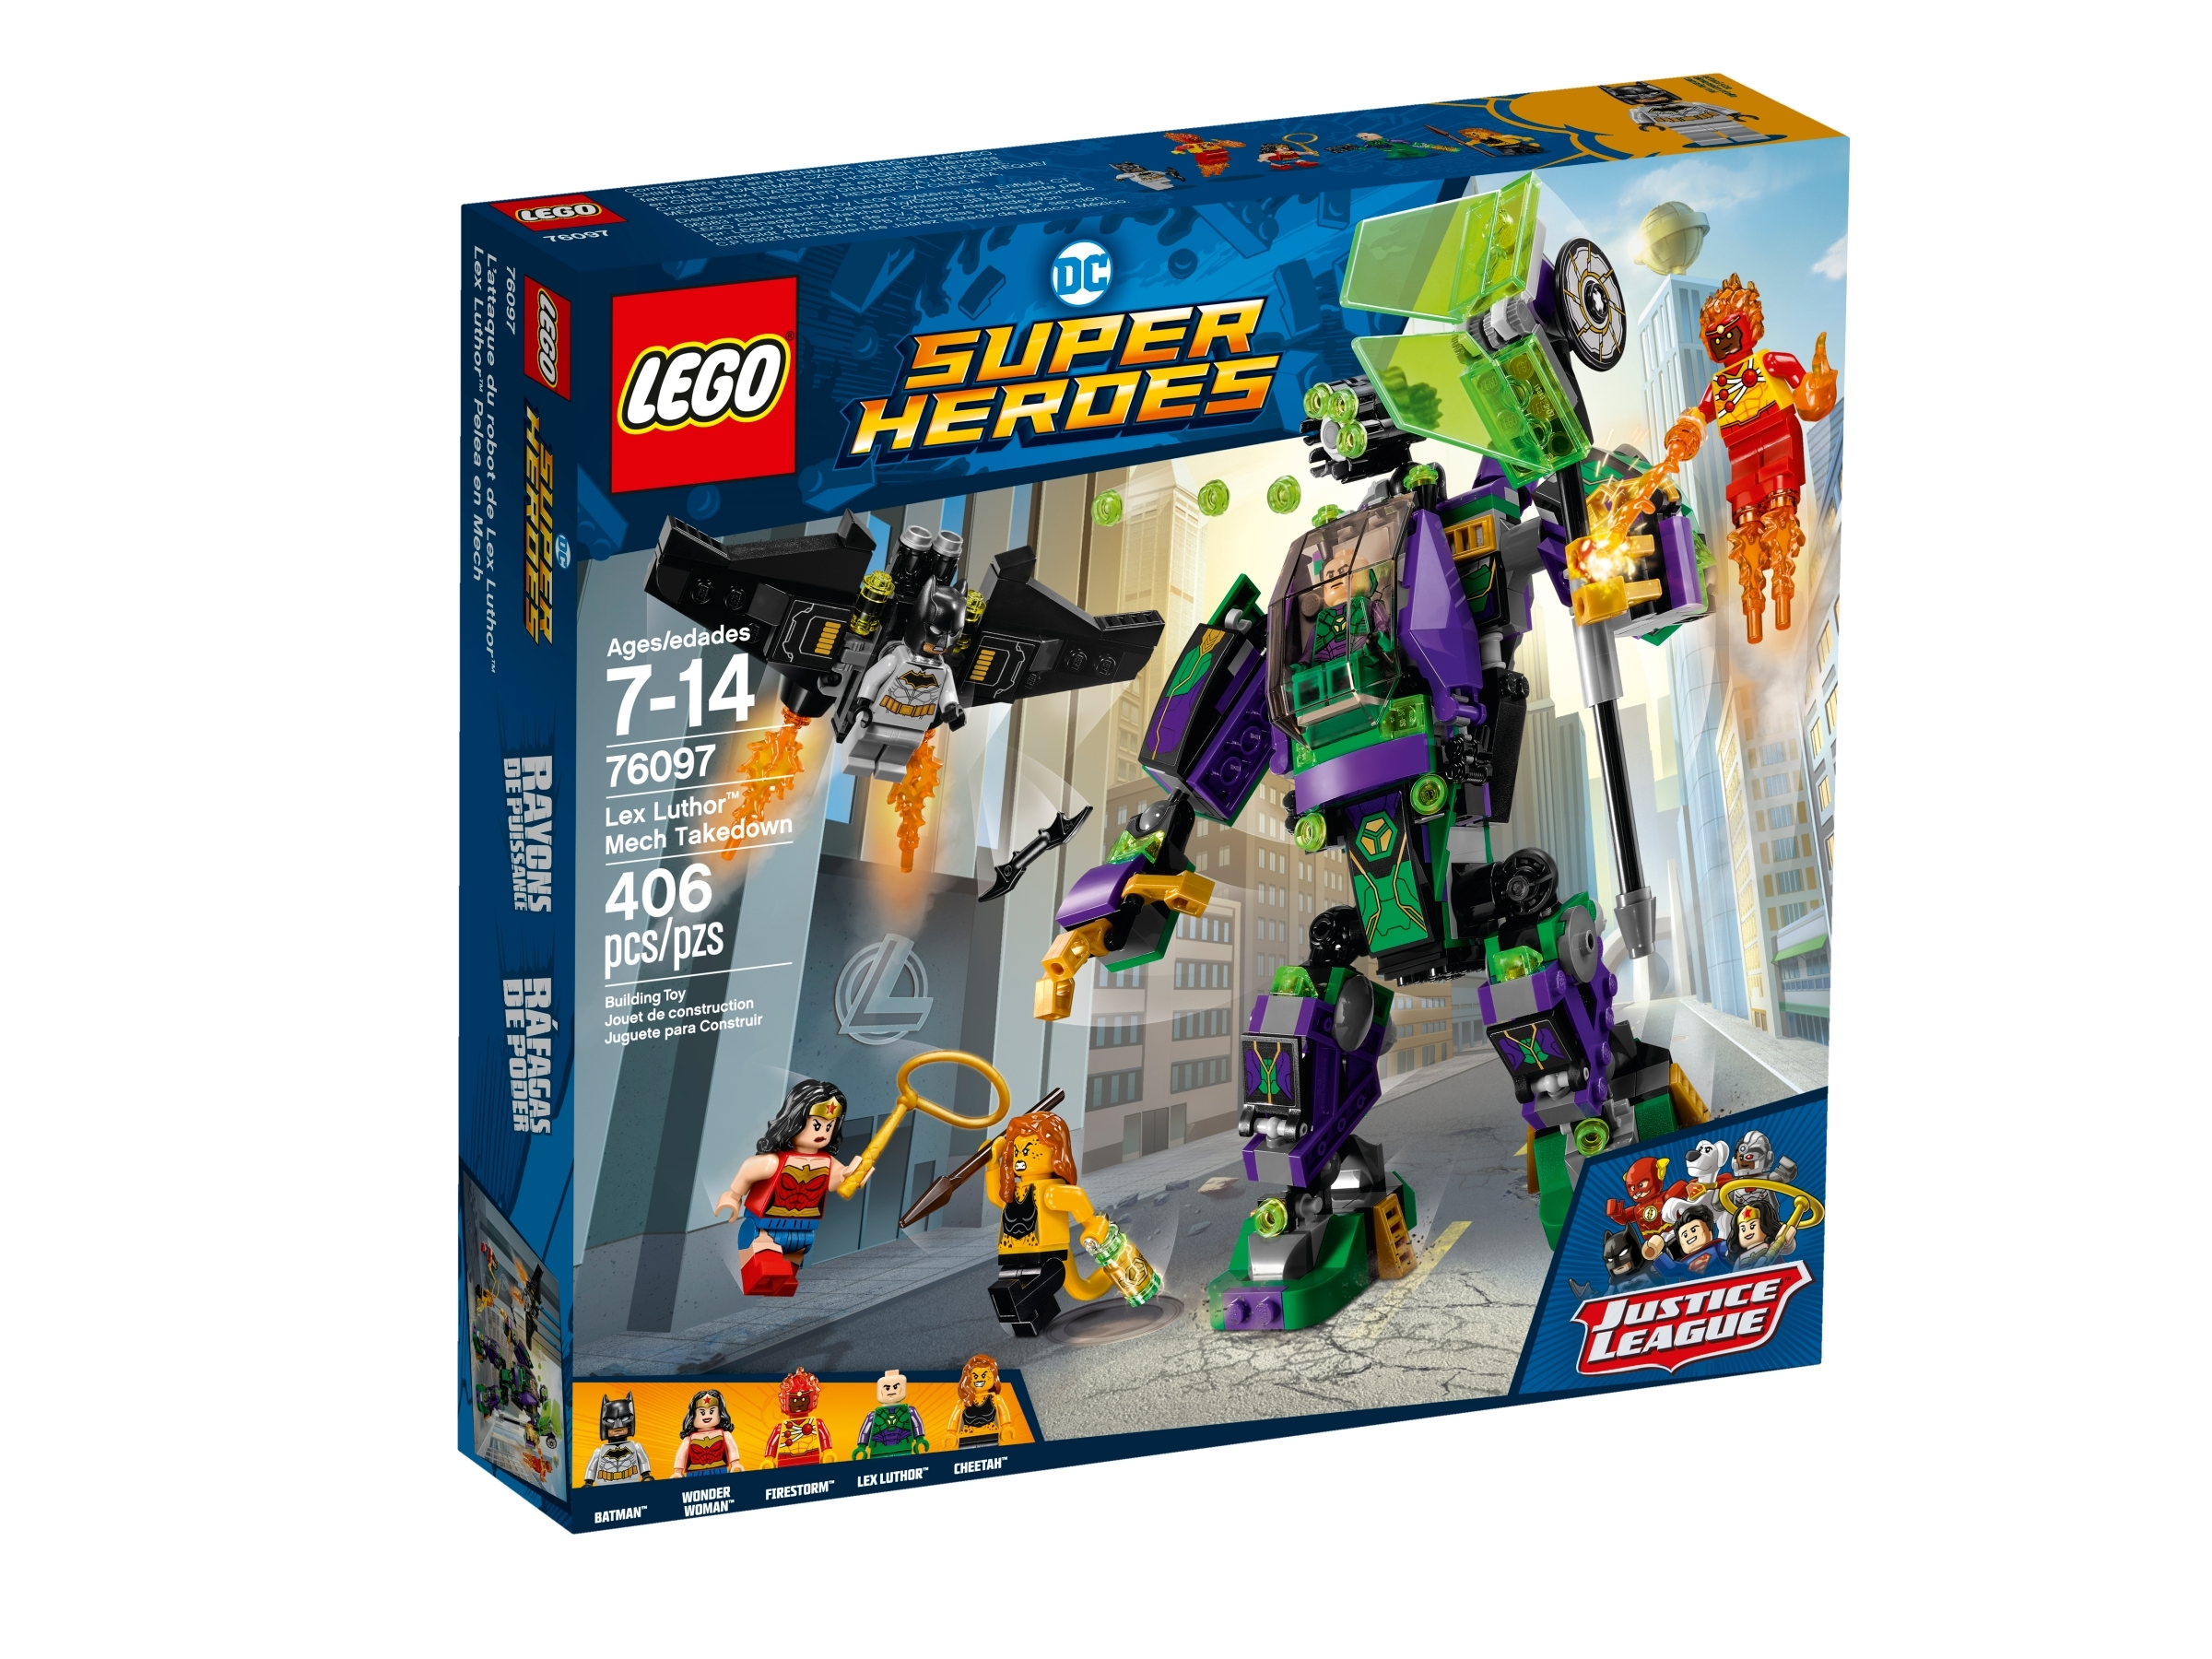 New Lego DC Super Heroes Lex Luthor Mech Takedown 76097 Lex Luthor Minifig